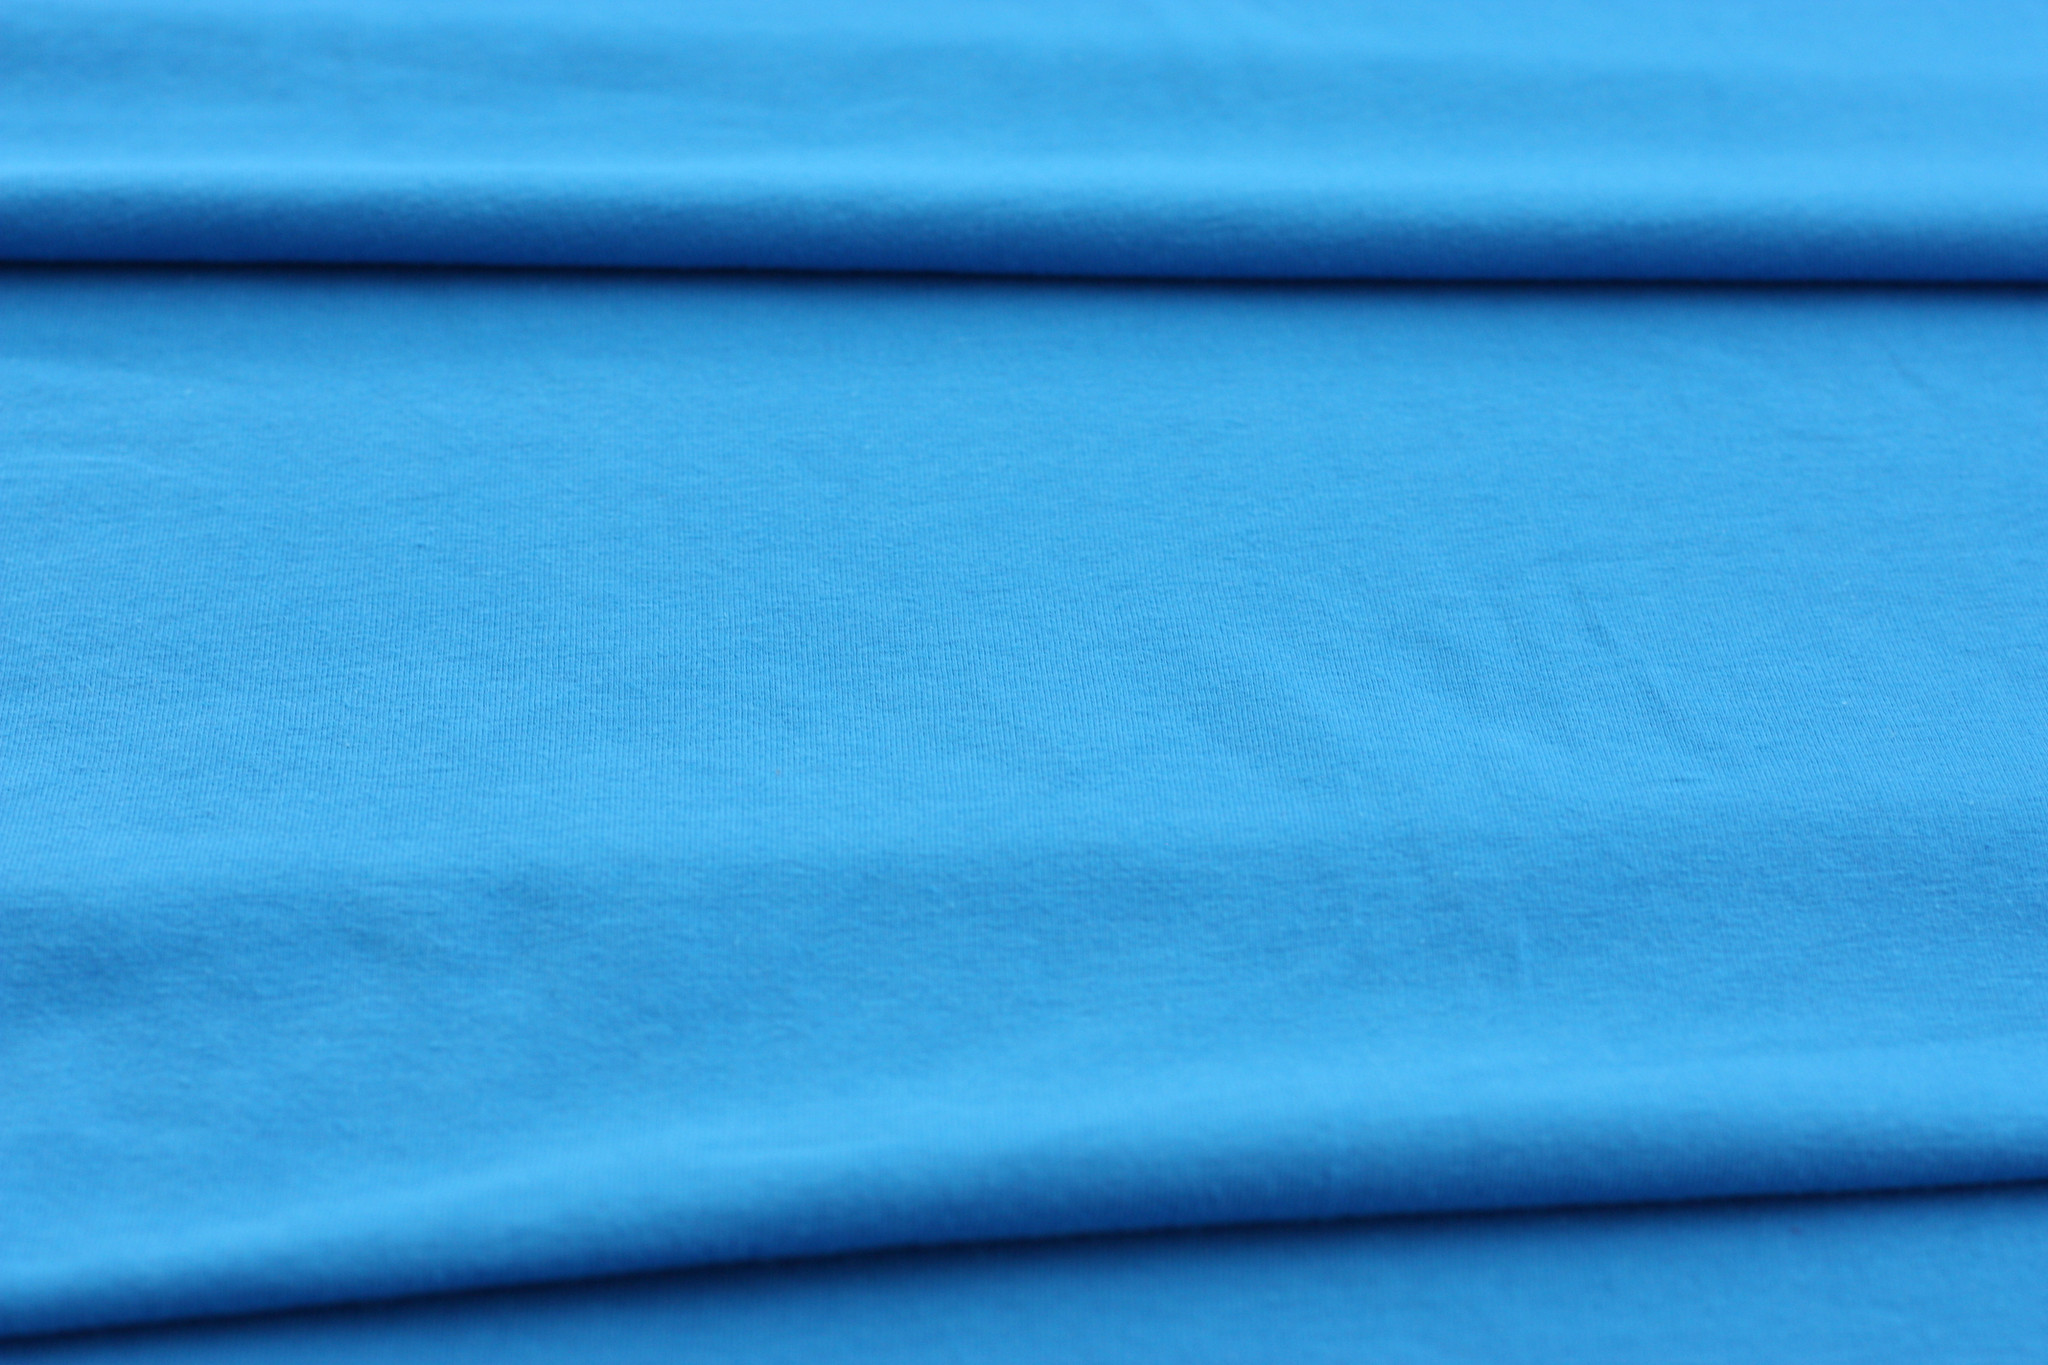 Turquoise Cotton Knit